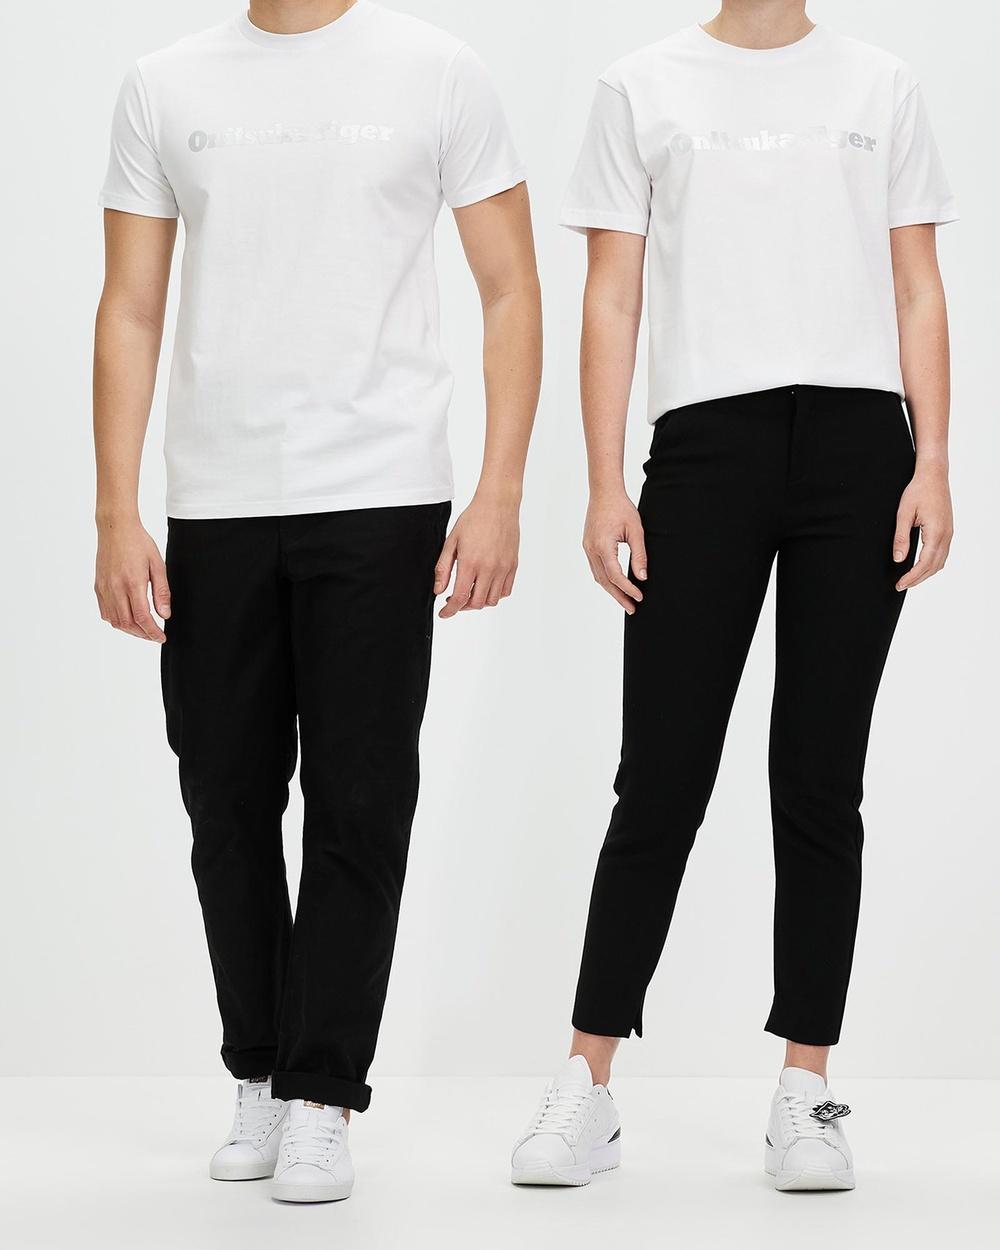 Onitsuka Tiger Tee Unisex T-Shirts & Singlets White Silver Australia